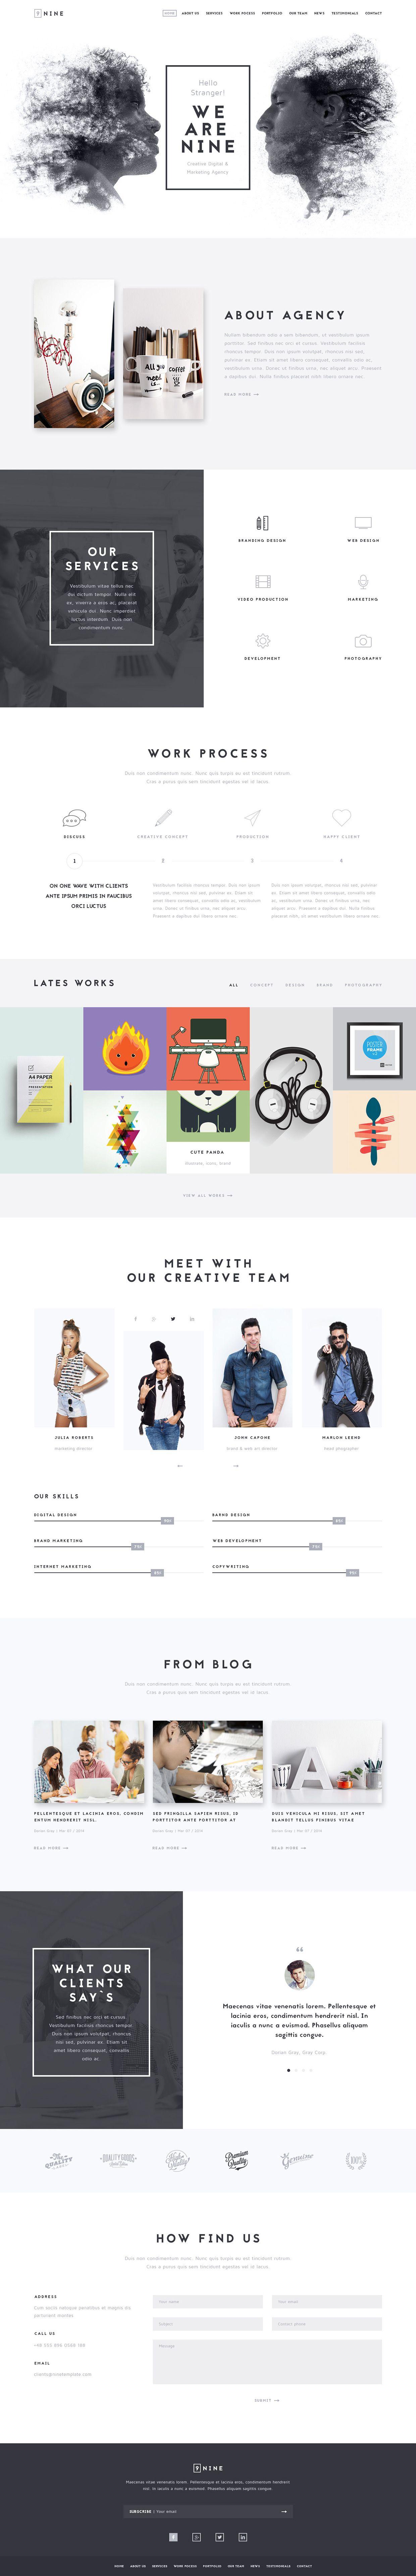 Creative Website Designs on Behance